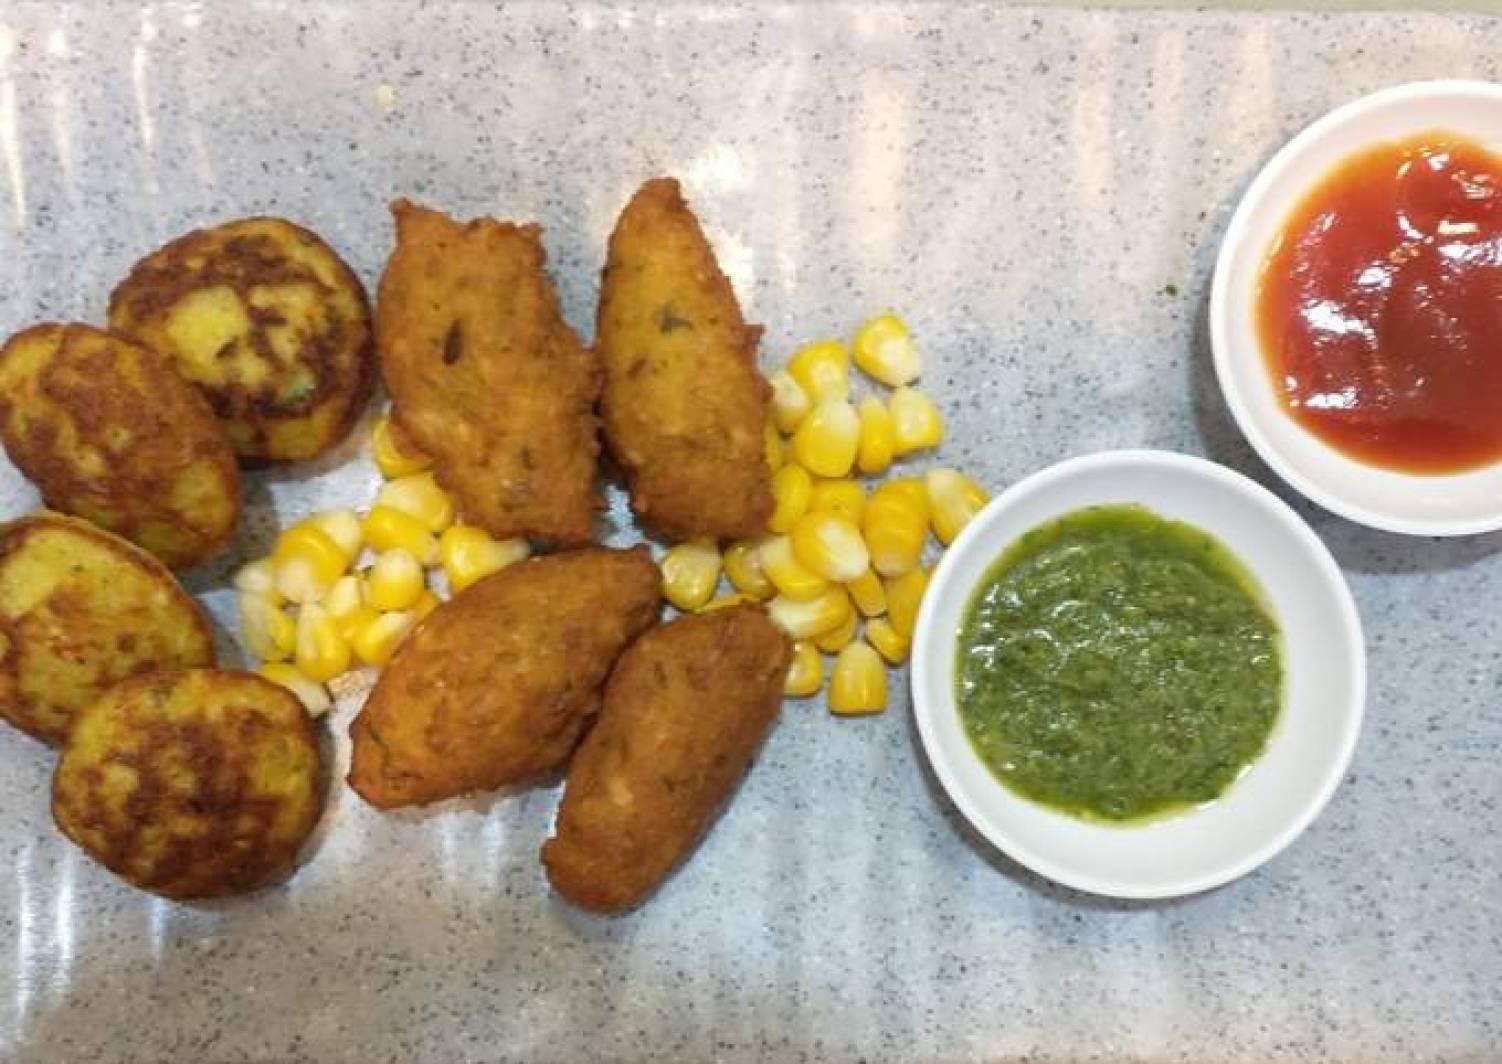 Corn pakodas (fritters) and appe